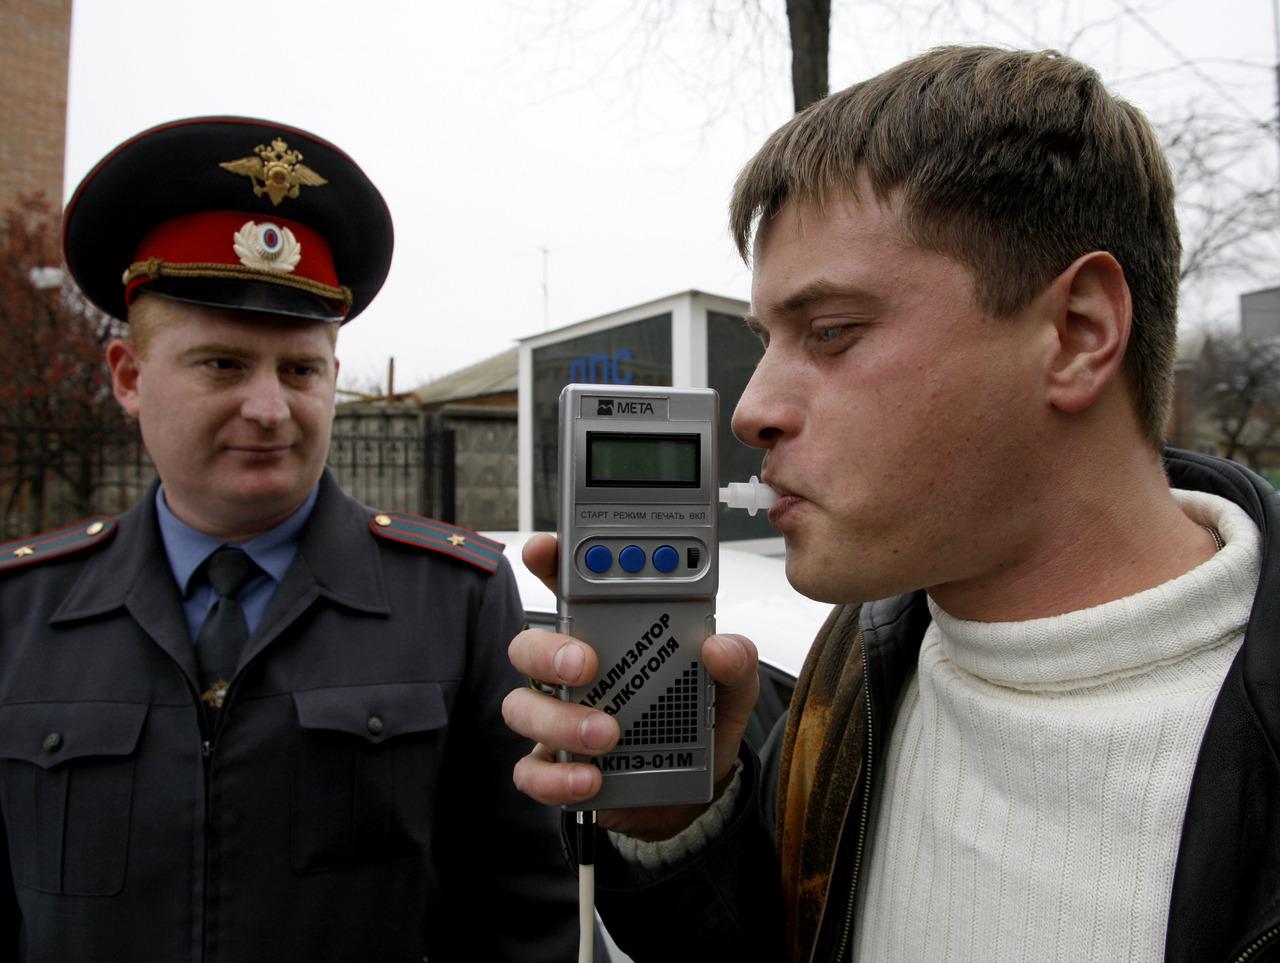 Проверка водителя алкотестером на состояние опьянения